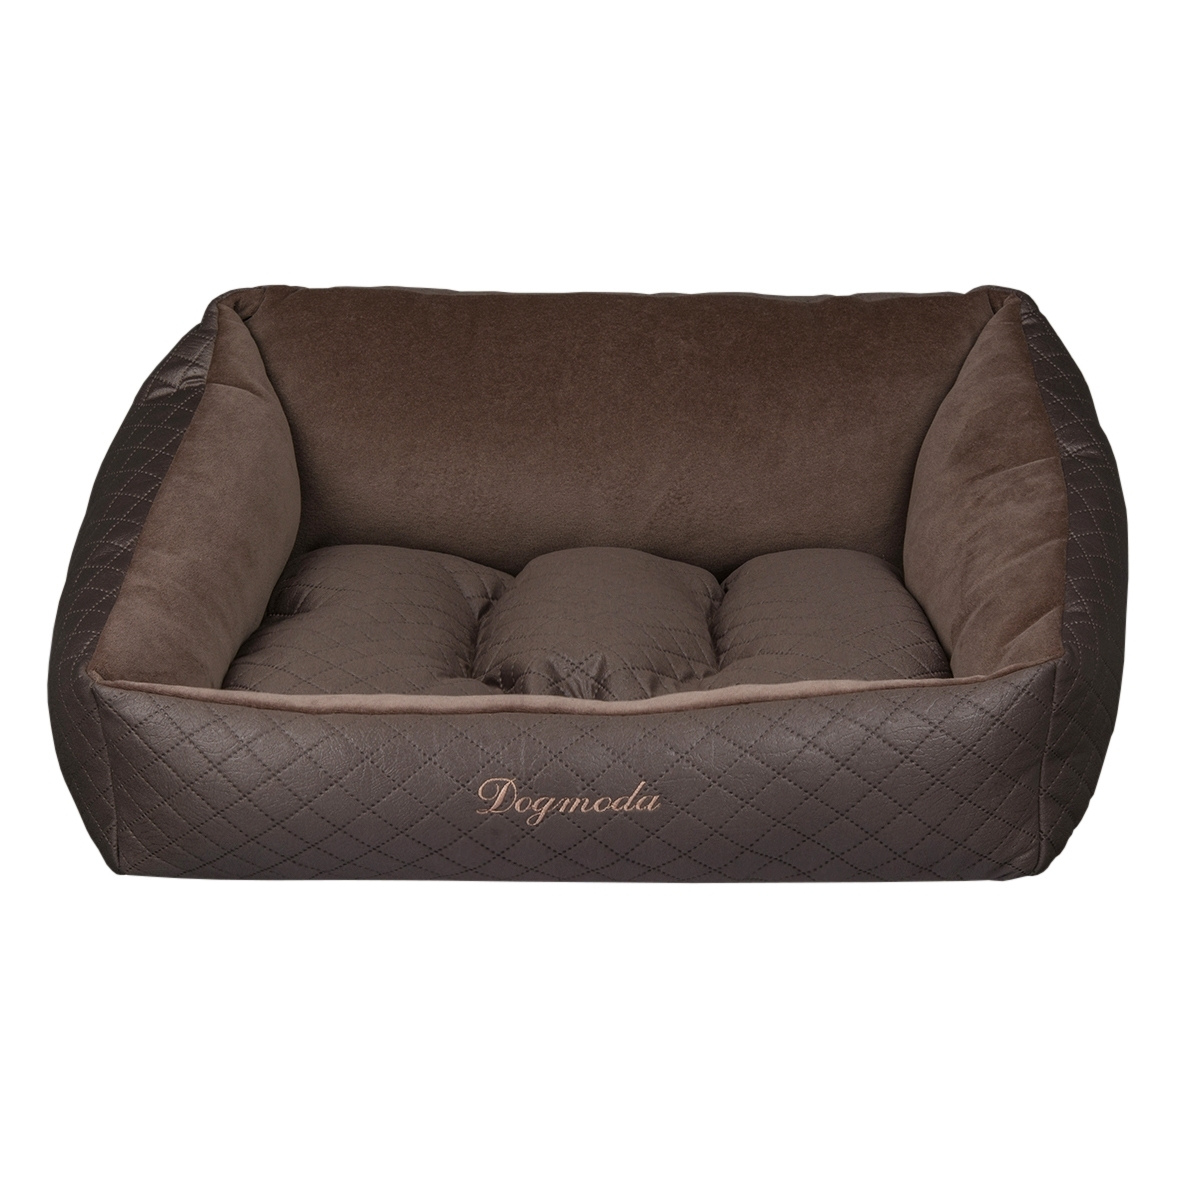 Лежак для животных Dogmoda Шоколад, 61 х 61 х 21 см лежак дарэлл хантер лось 2 с подушкой 55 40 16см